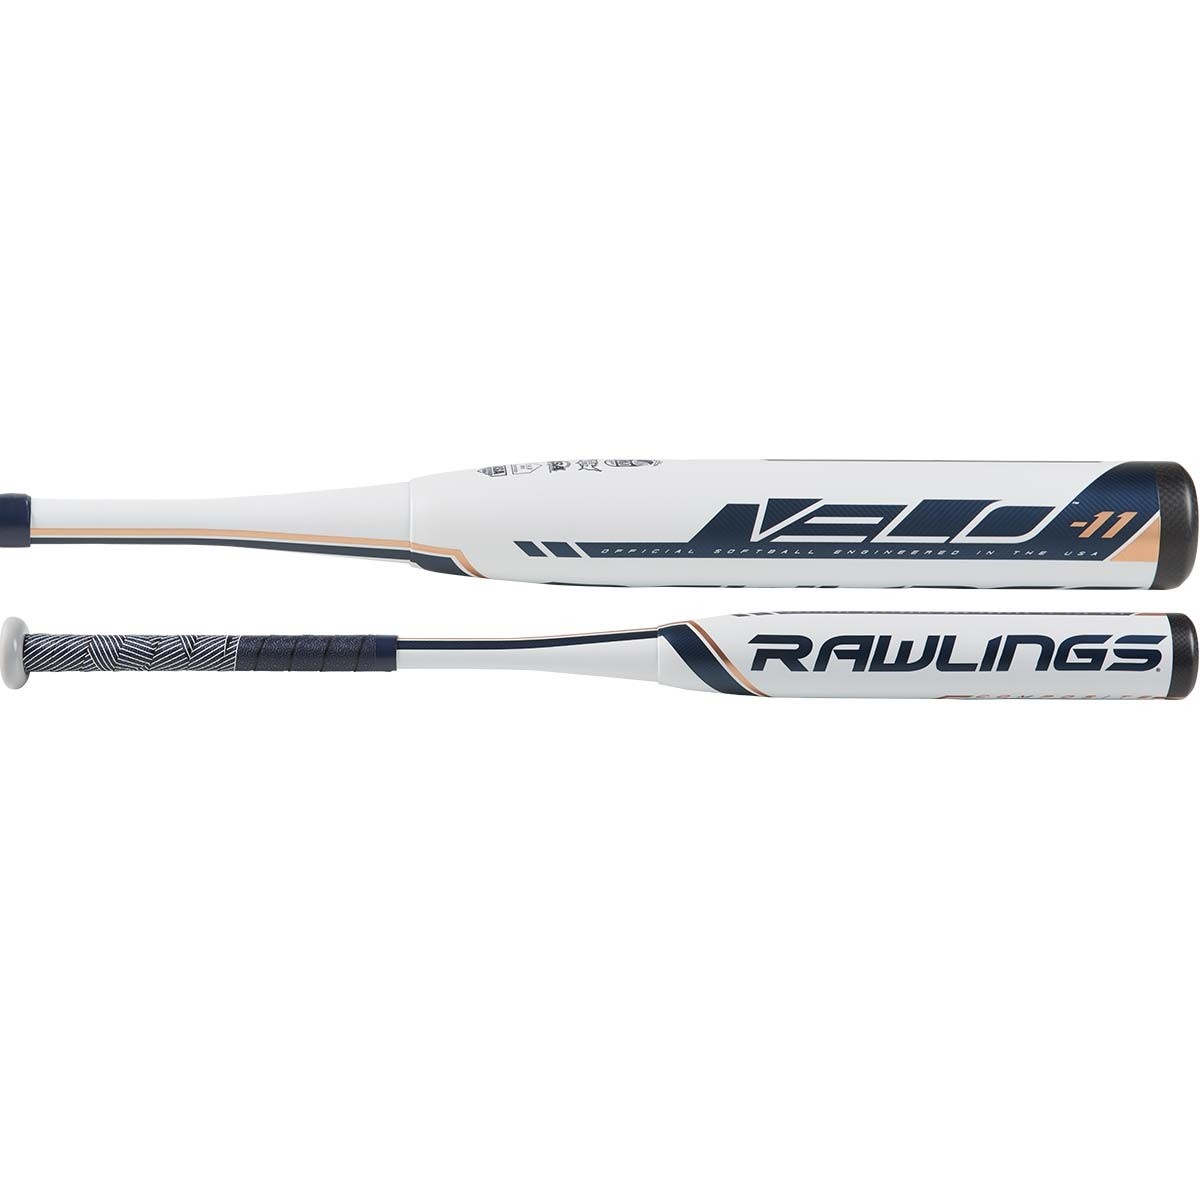 2019 Rawlings Velo -11 Composite Fastpitch Softball Bat, FP9V11